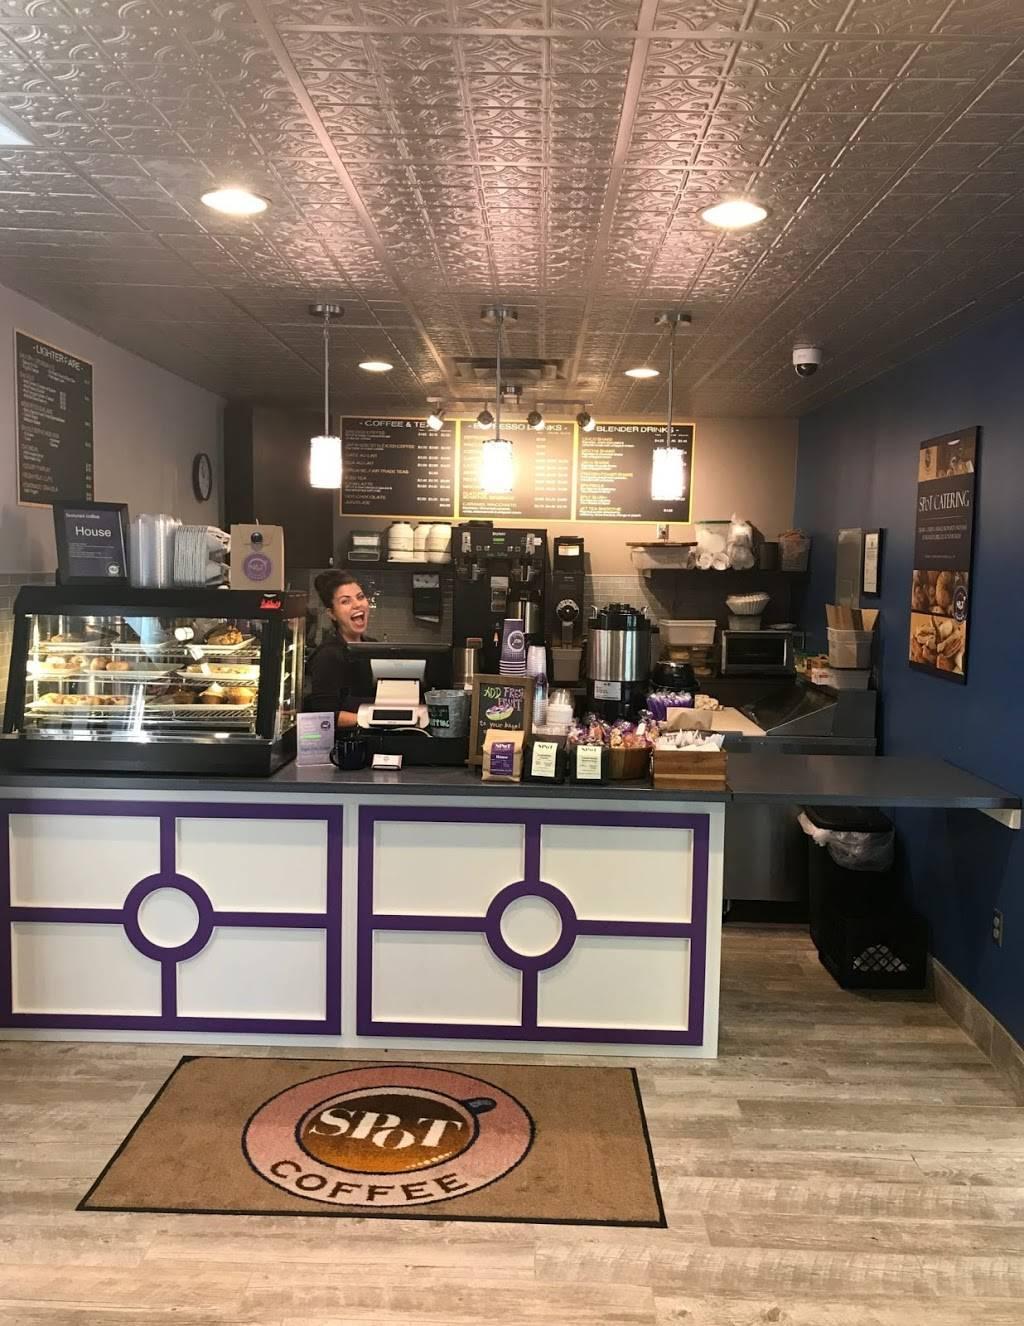 SPoT Coffee Express - cafe  | Photo 1 of 4 | Address: 50 Lakefront Blvd #116, Buffalo, NY 14202, USA | Phone: (716) 262-0955